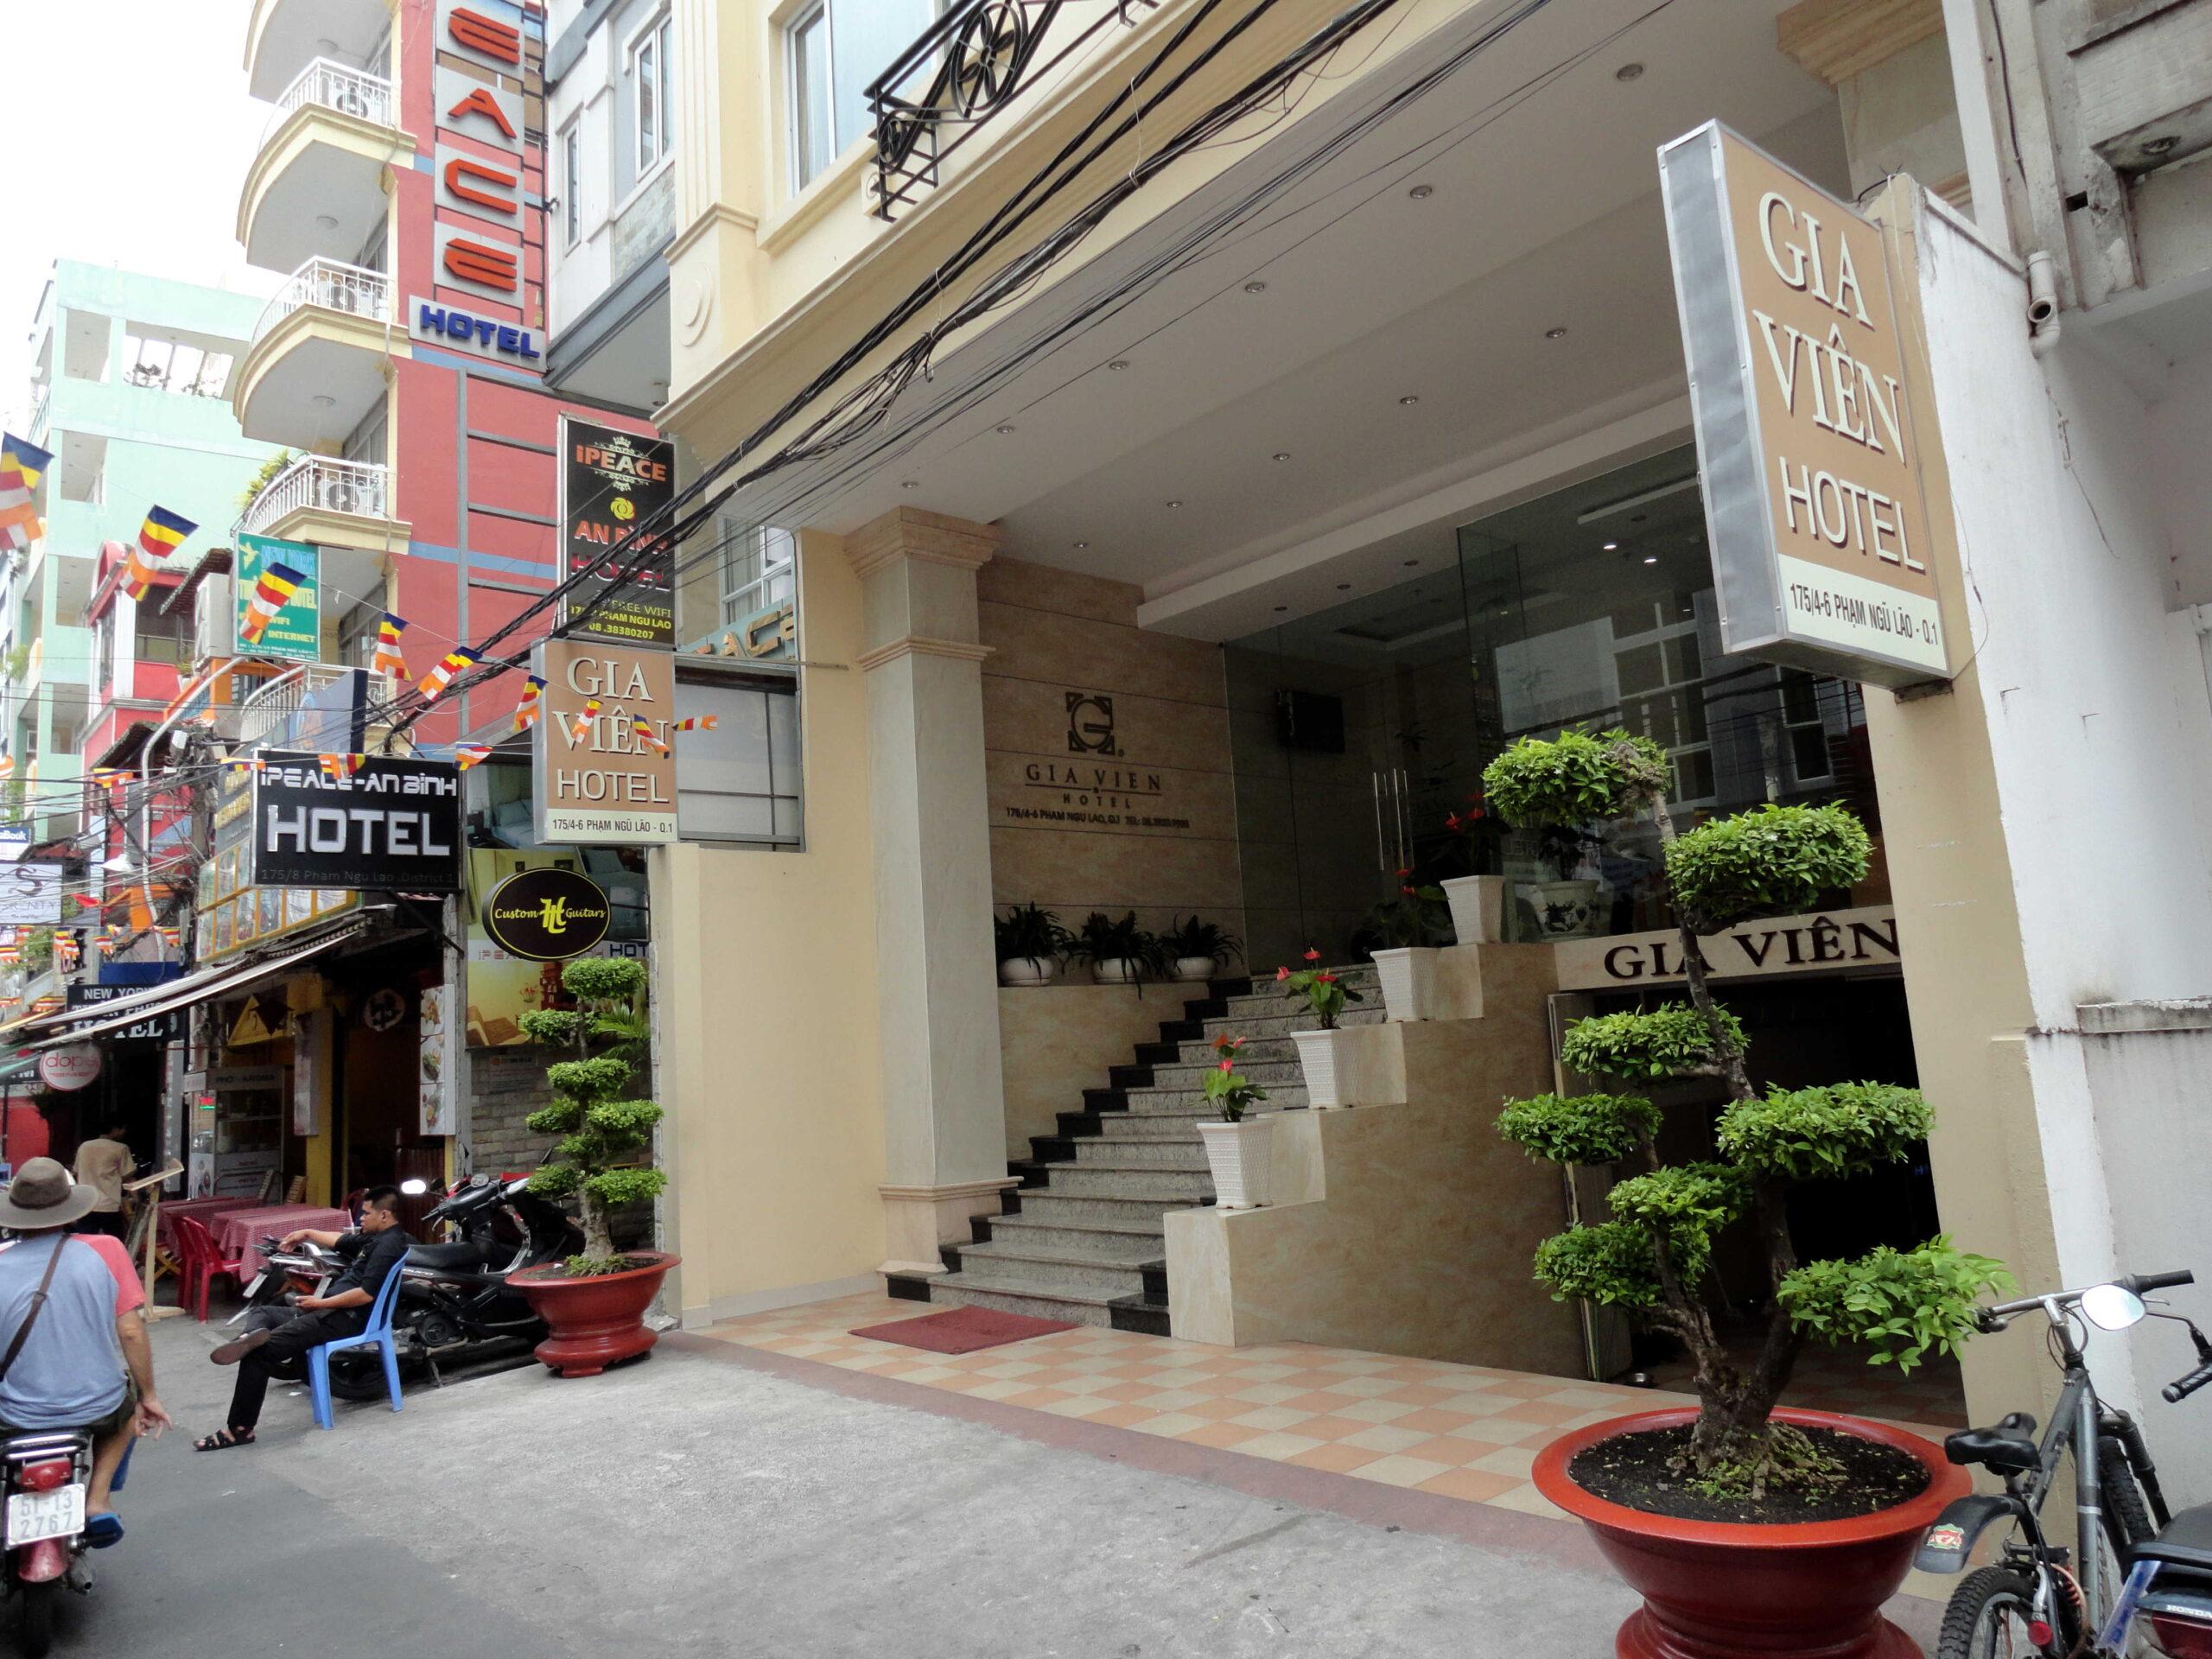 Gia Vien Hotel HCMC